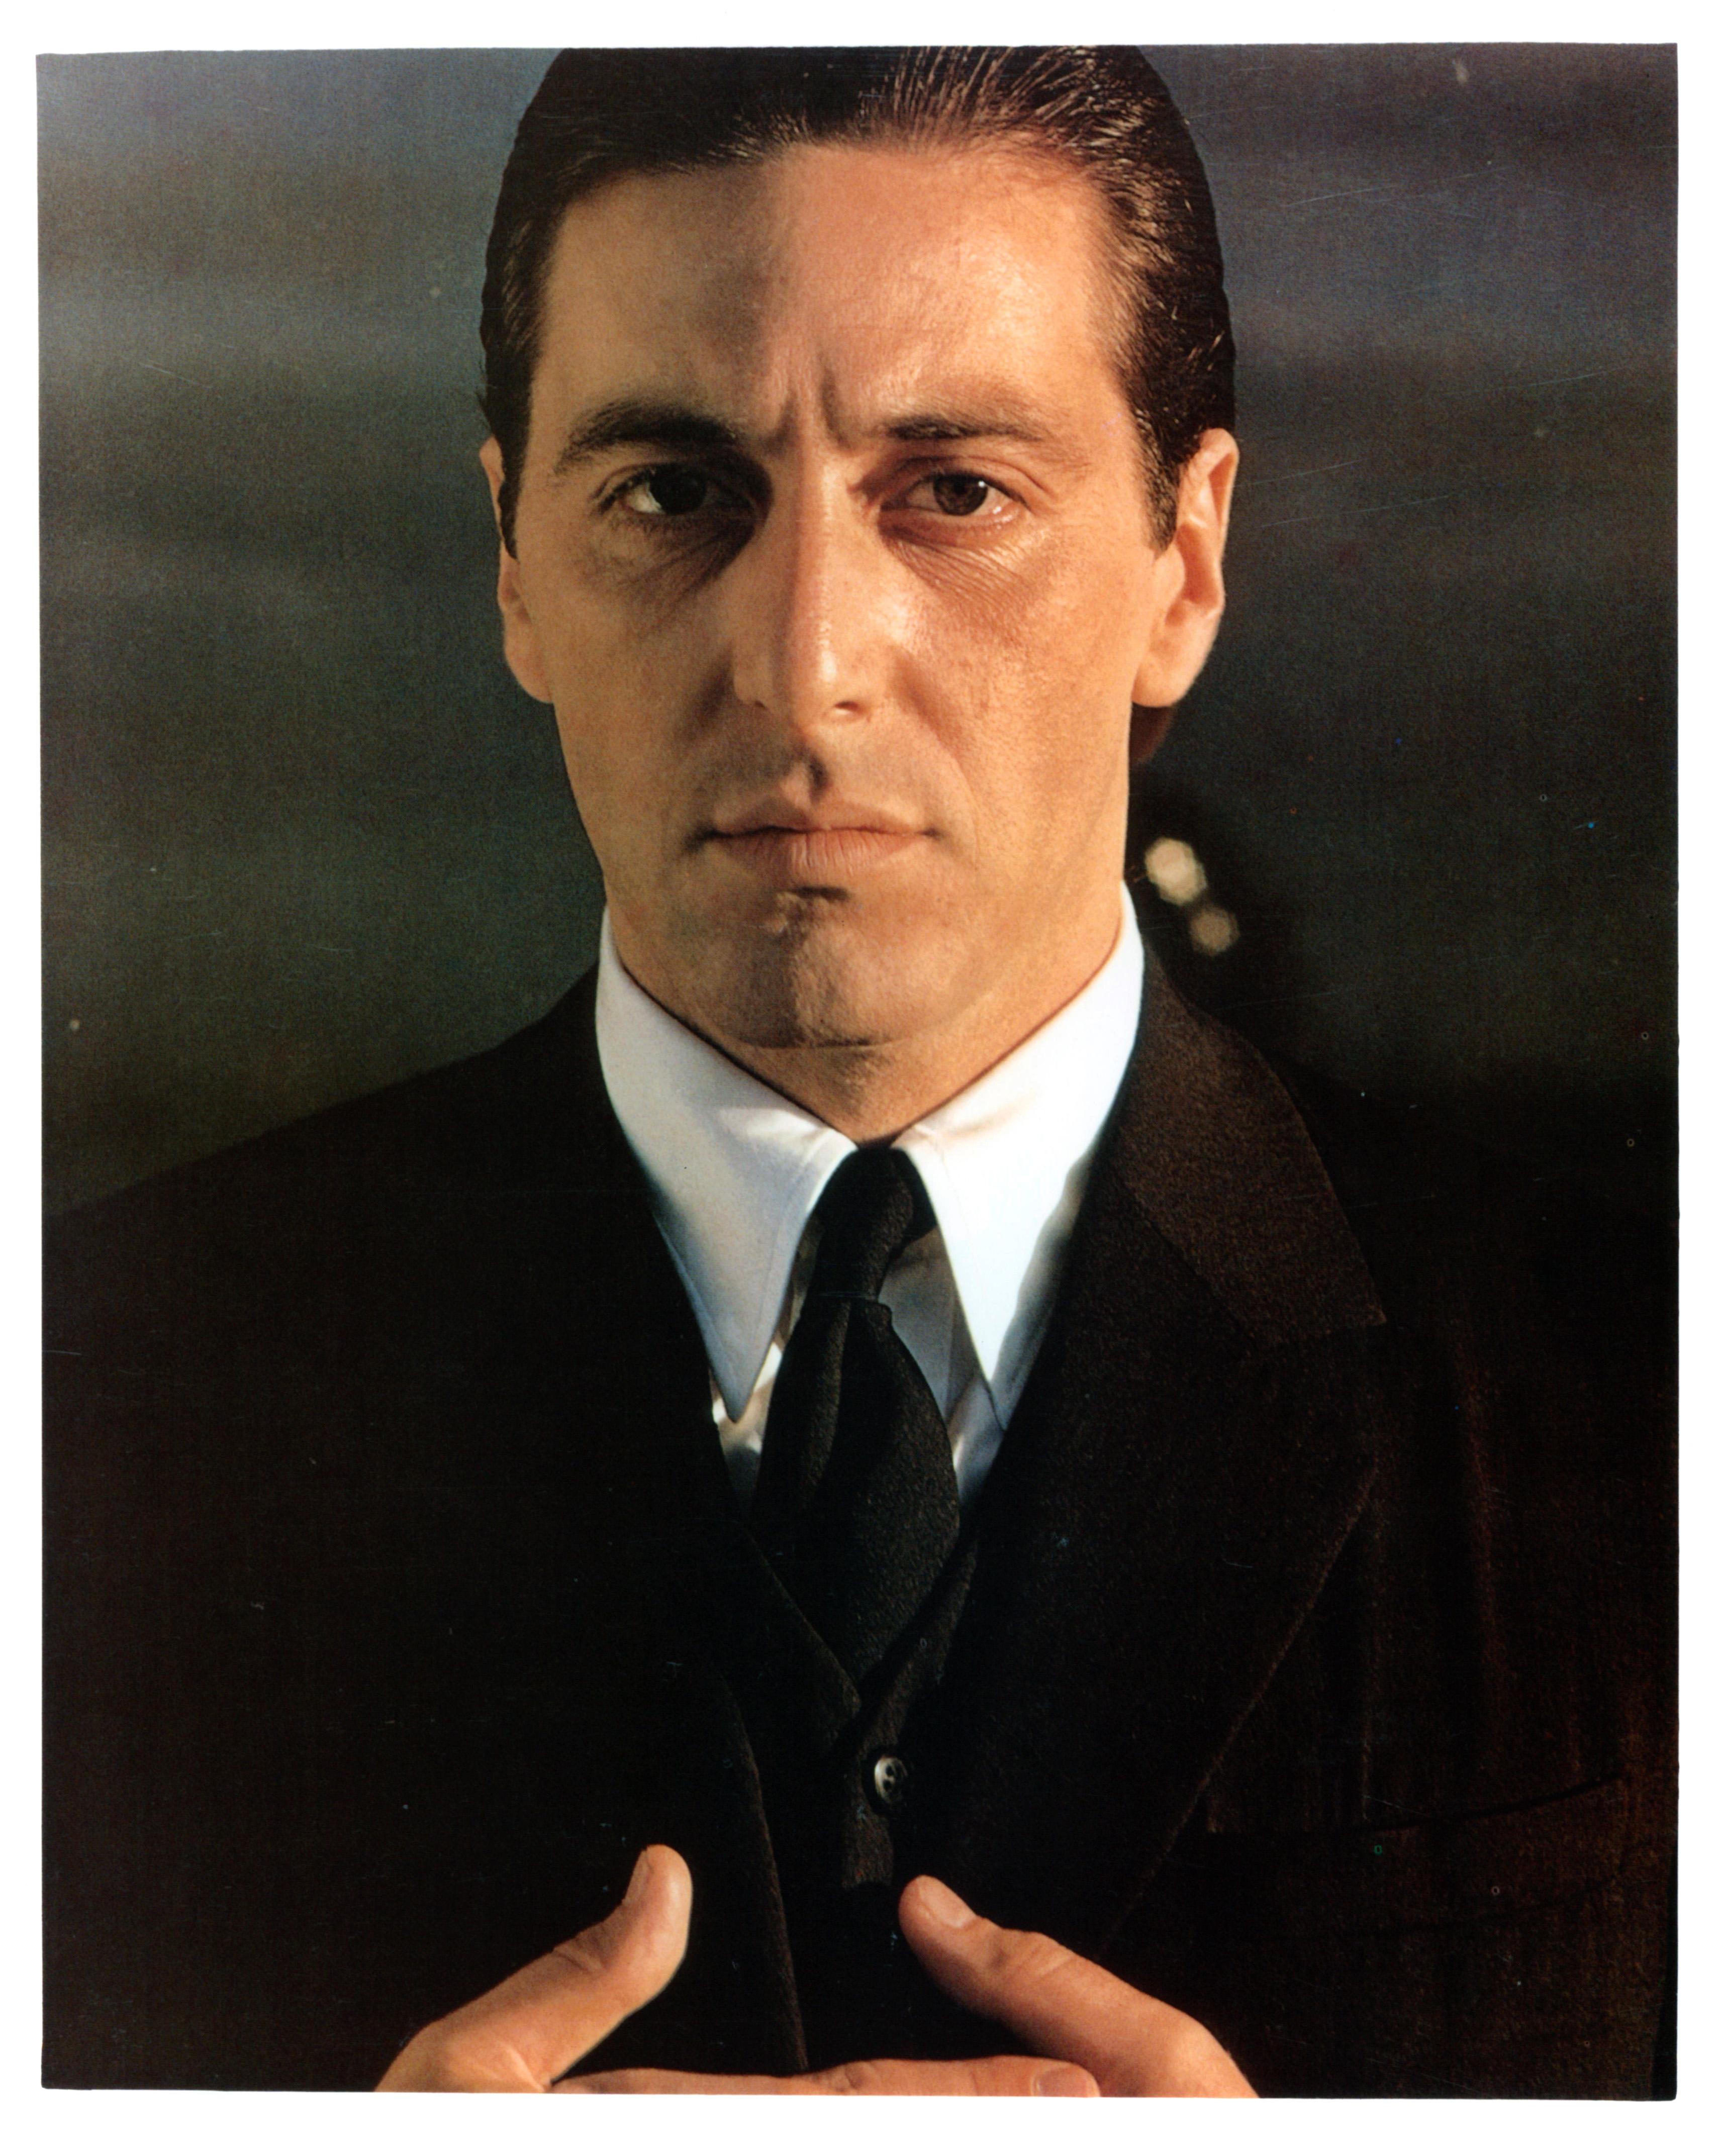 Al Pacino in The Godfather: Part II (1974)